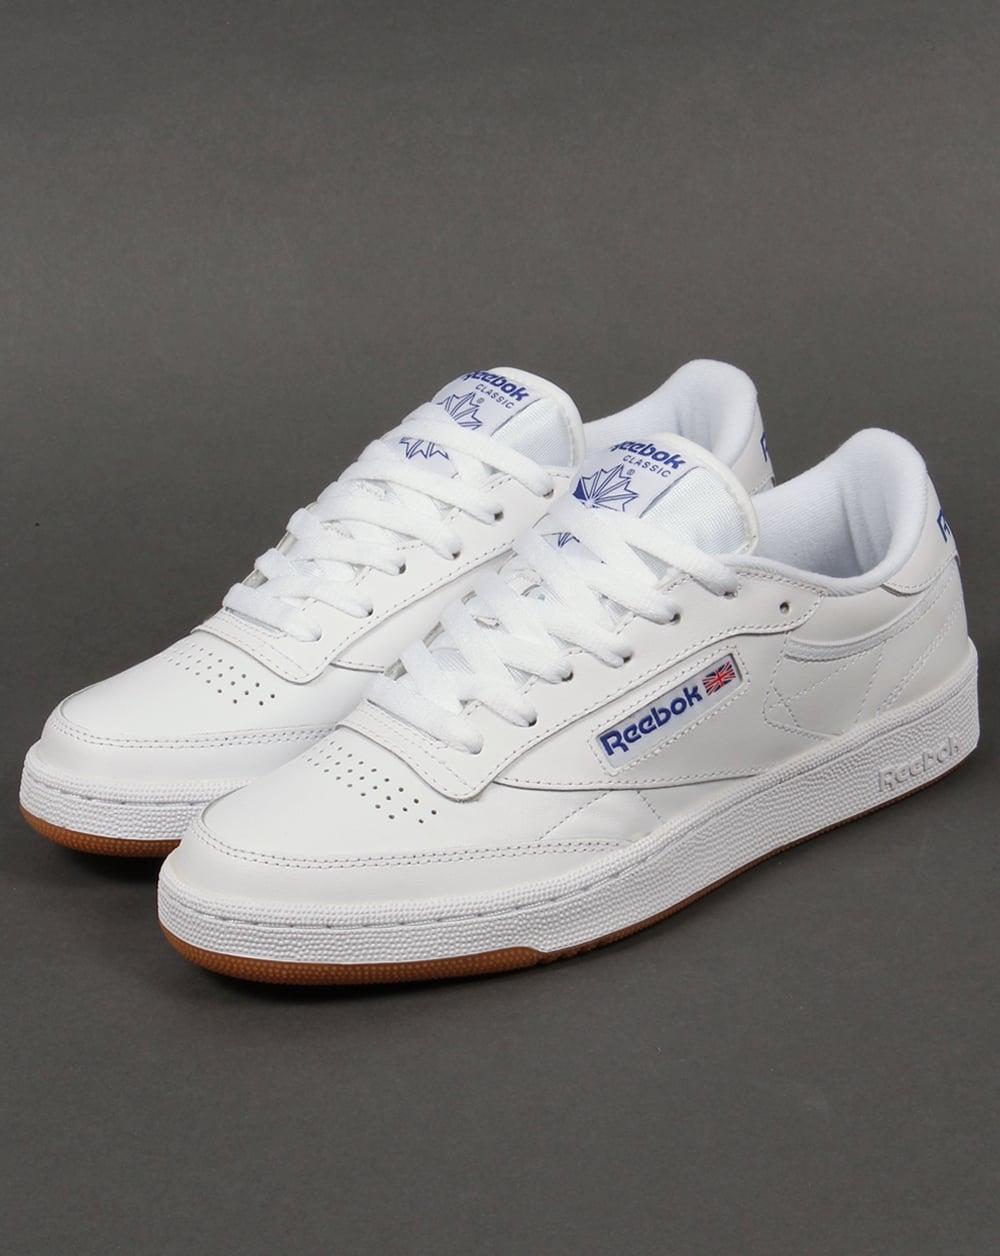 reebok club c classic tennis shoe